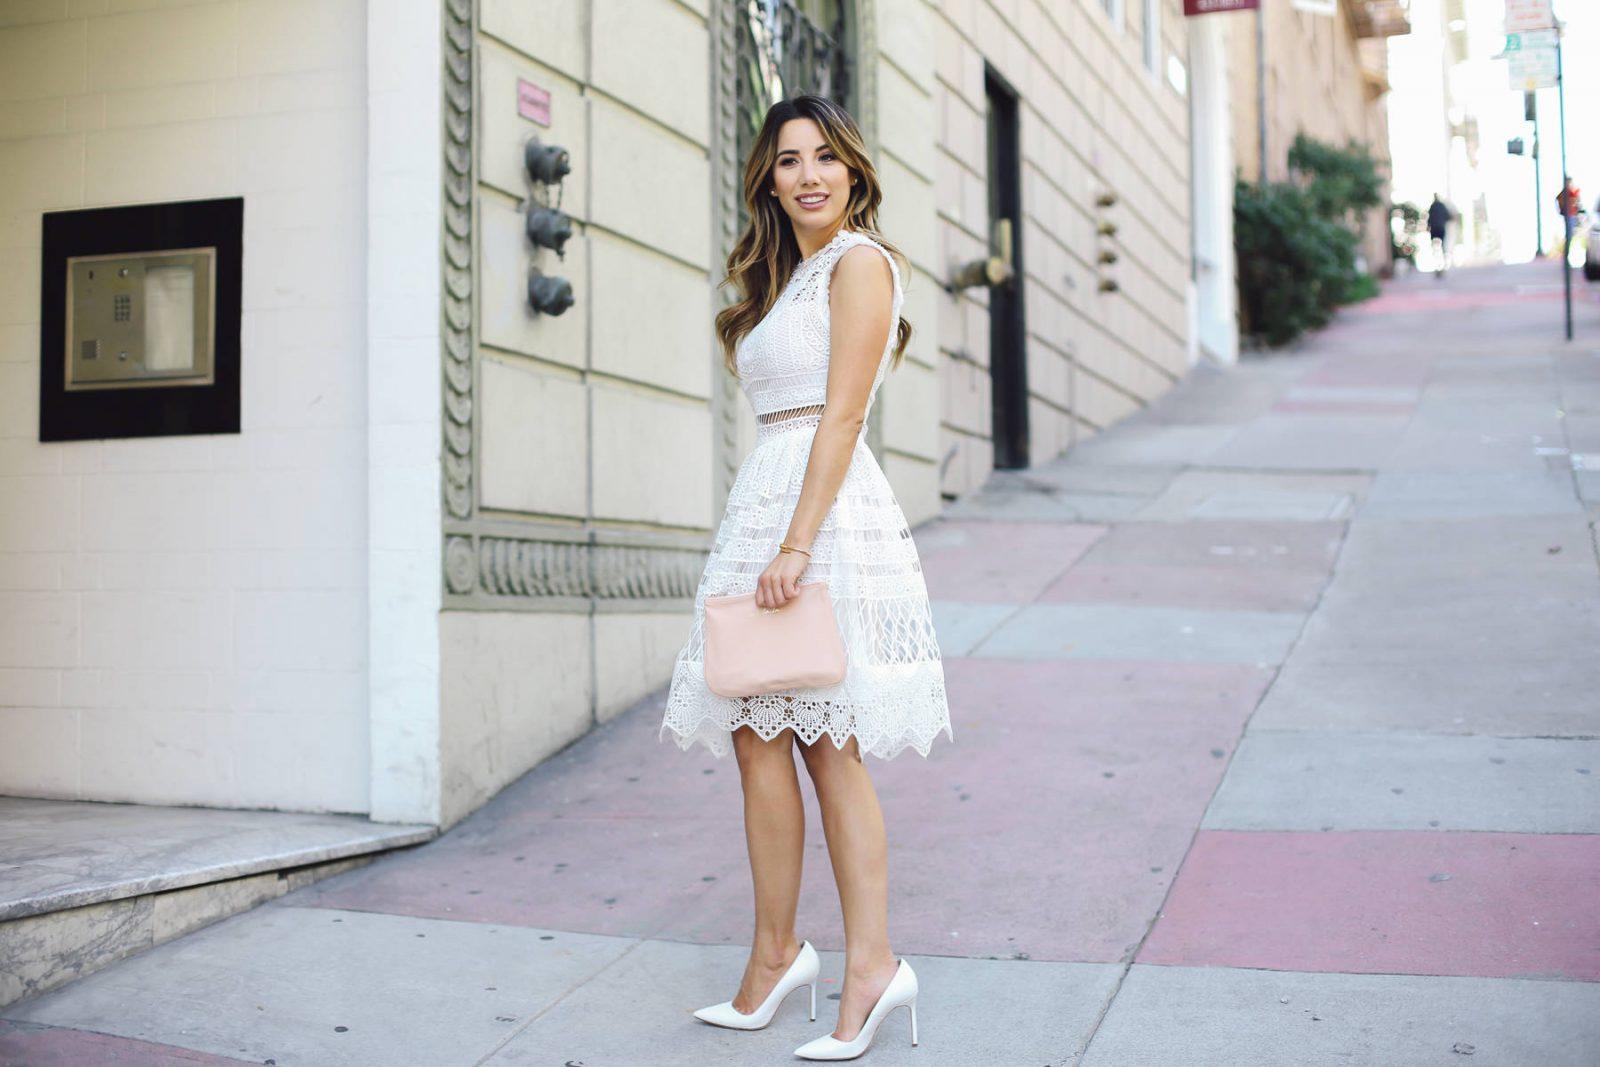 Ariana-Lauren-Fashionborn-White-Laced-Skater-Dress-Fashion-Blogger-Photography-by-Ryan-Chua-8483